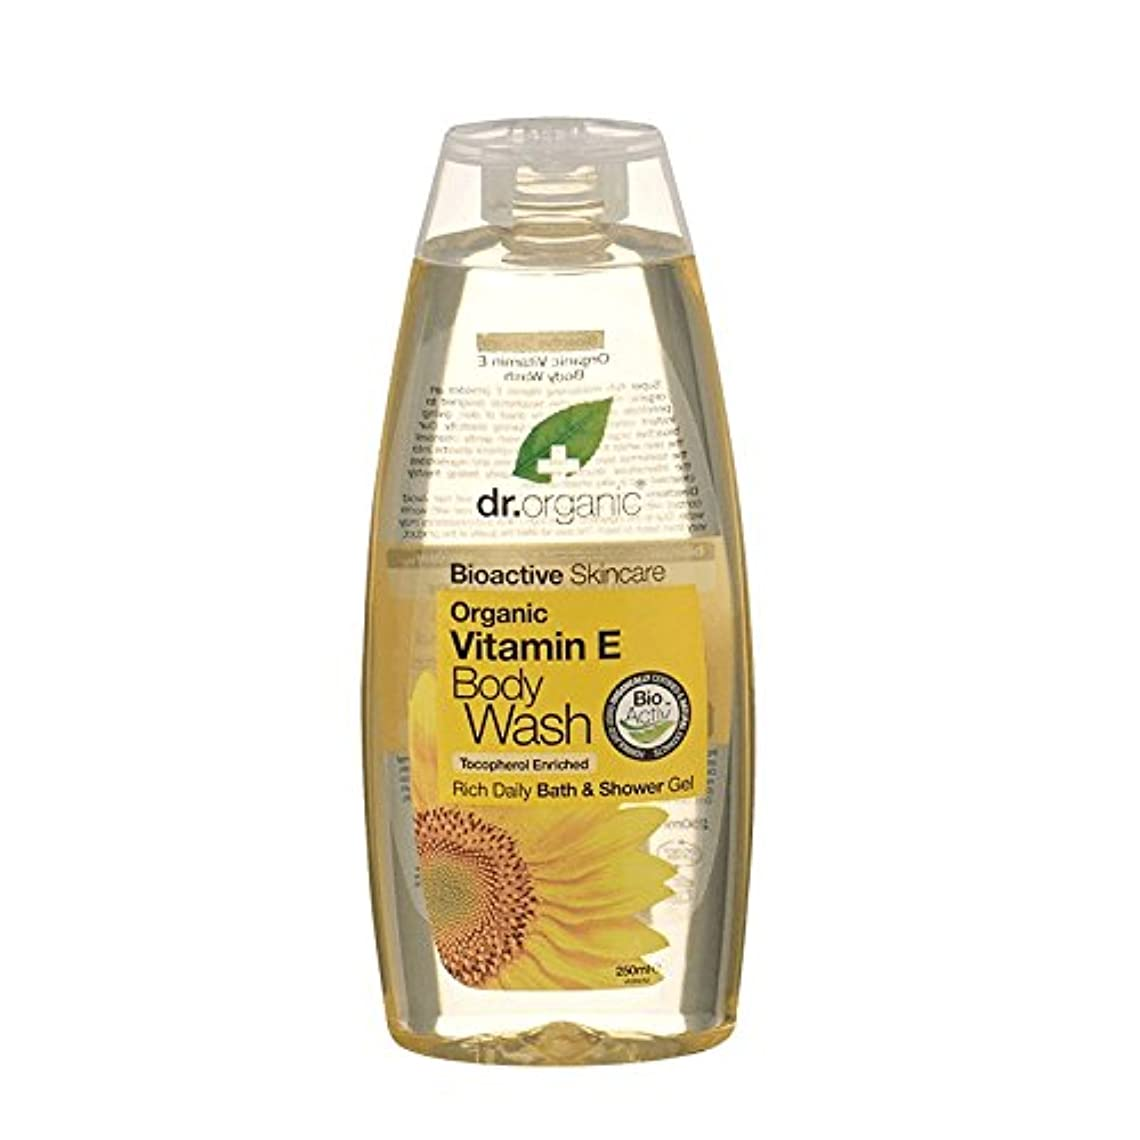 Dr Organic Vitamin E Body Wash (Pack of 2) - Dr有機ビタミンEボディウォッシュ (x2) [並行輸入品]